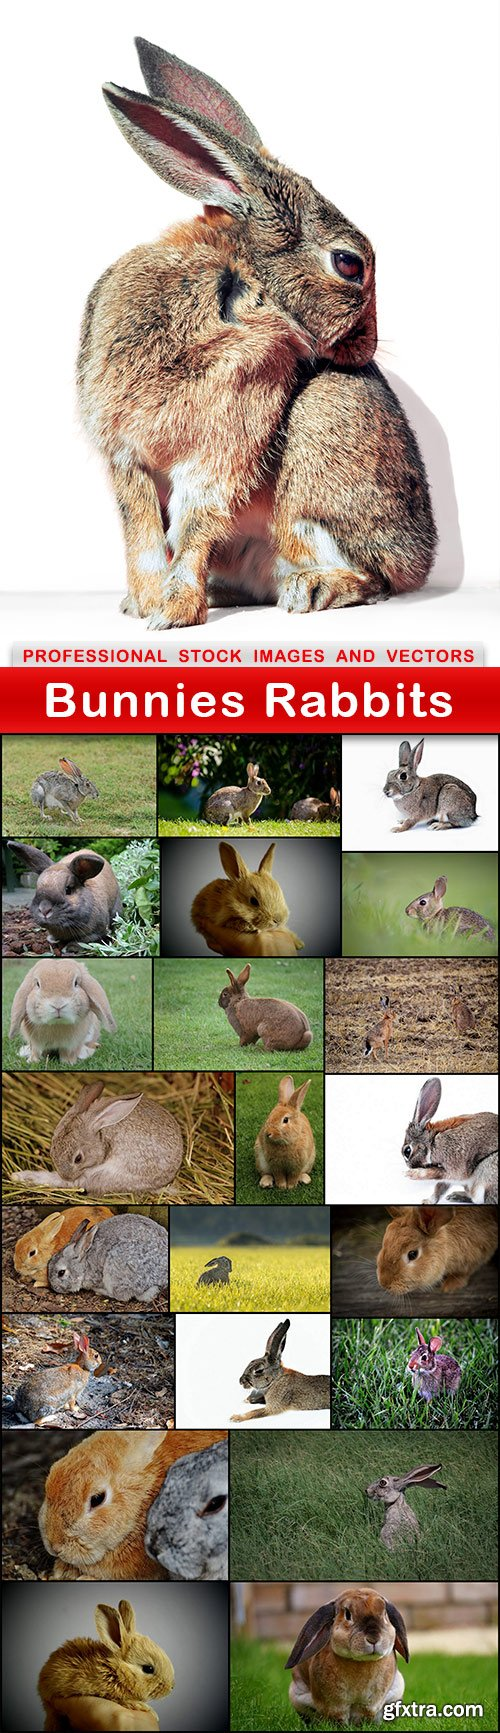 Bunnies Rabbits - 23 UHQ JPEG